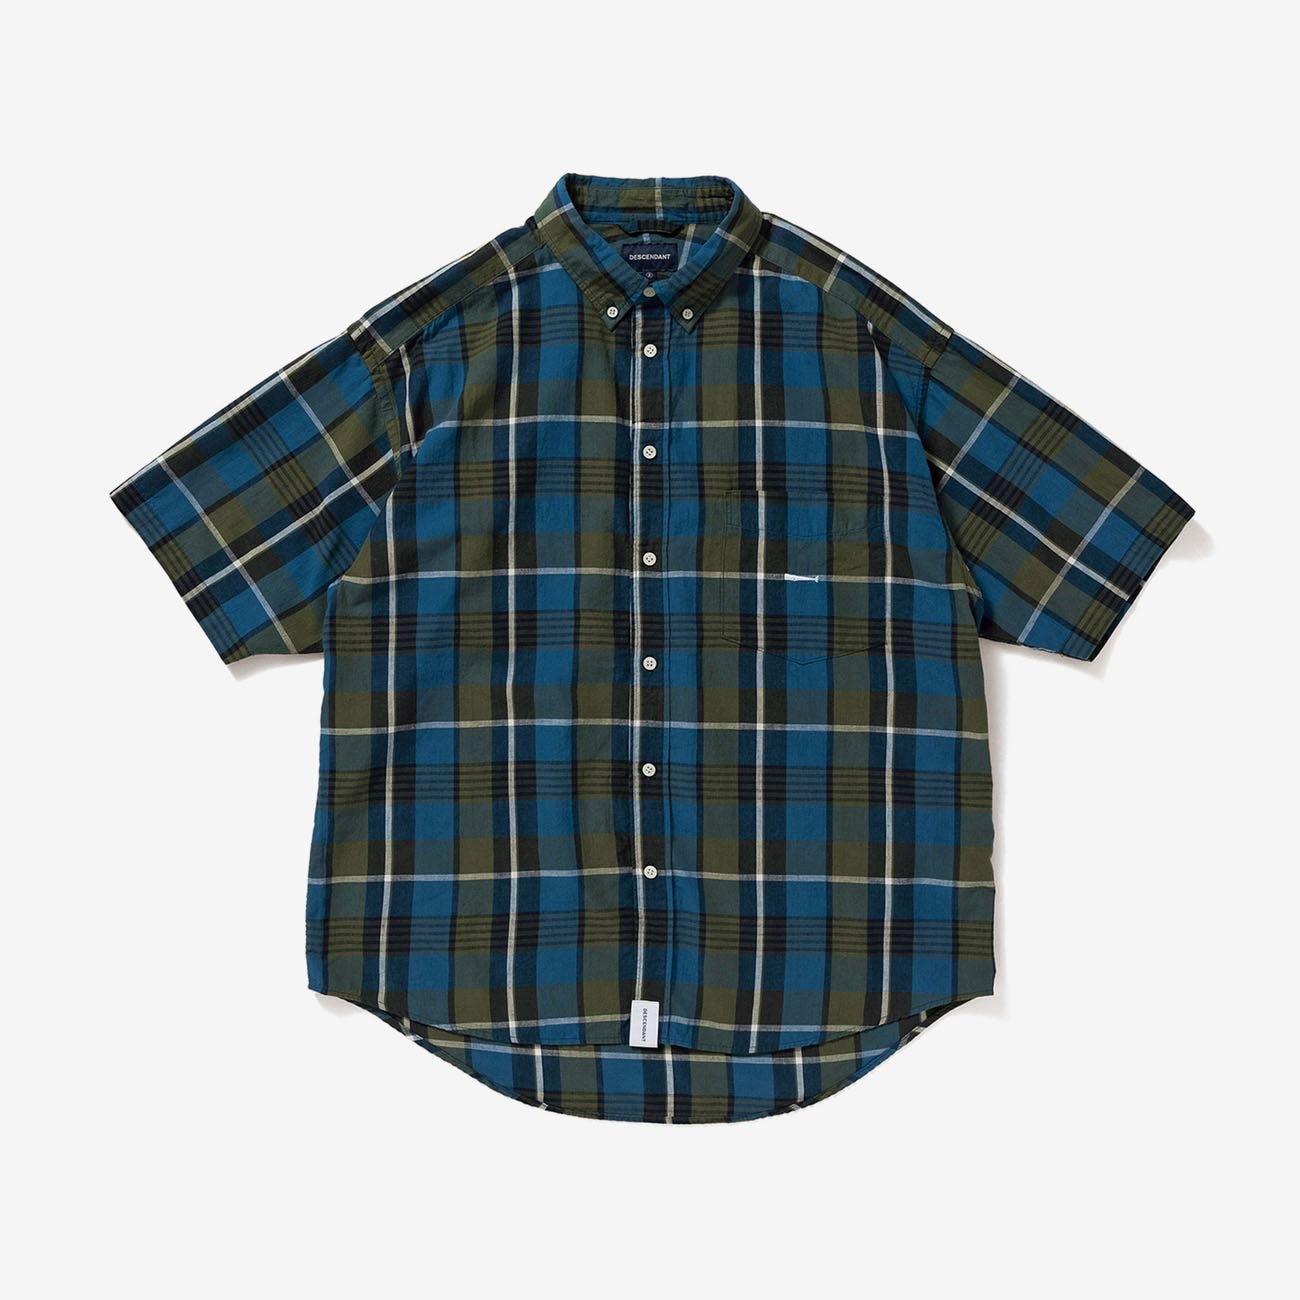 DESCENDANT DCDT HYANNIS B.D SS SHIRT FULL SIZE 格紋短袖襯衫。太陽選物社